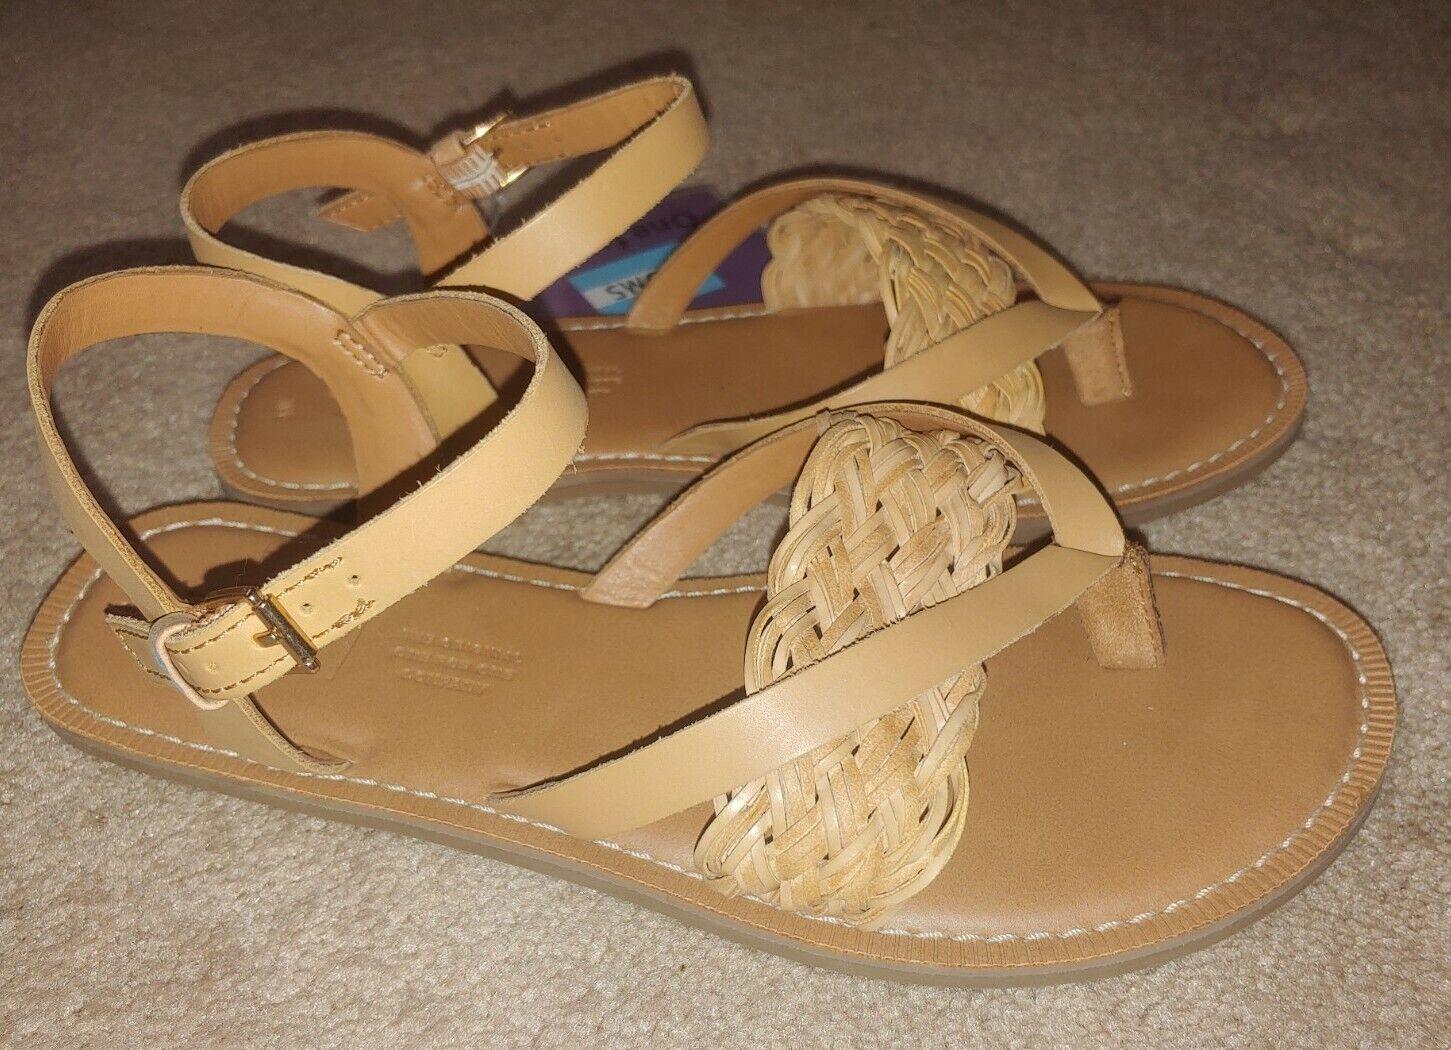 NWT Toms Women's Flat Ankle Strap Braid Sandals - Women's Size 6 - Honey